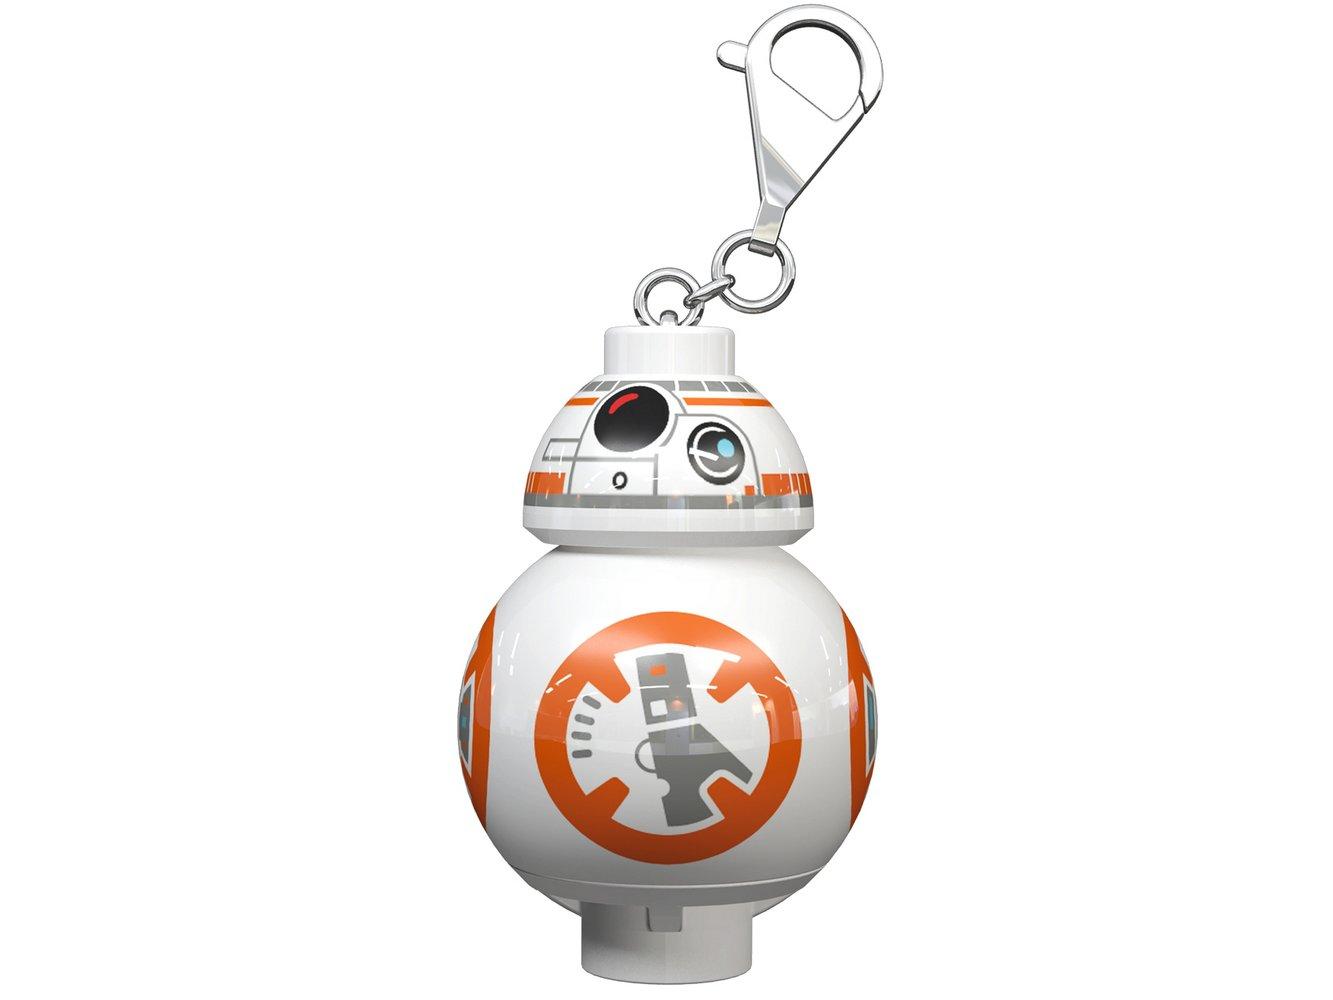 BB-8 Minifigure Key Light